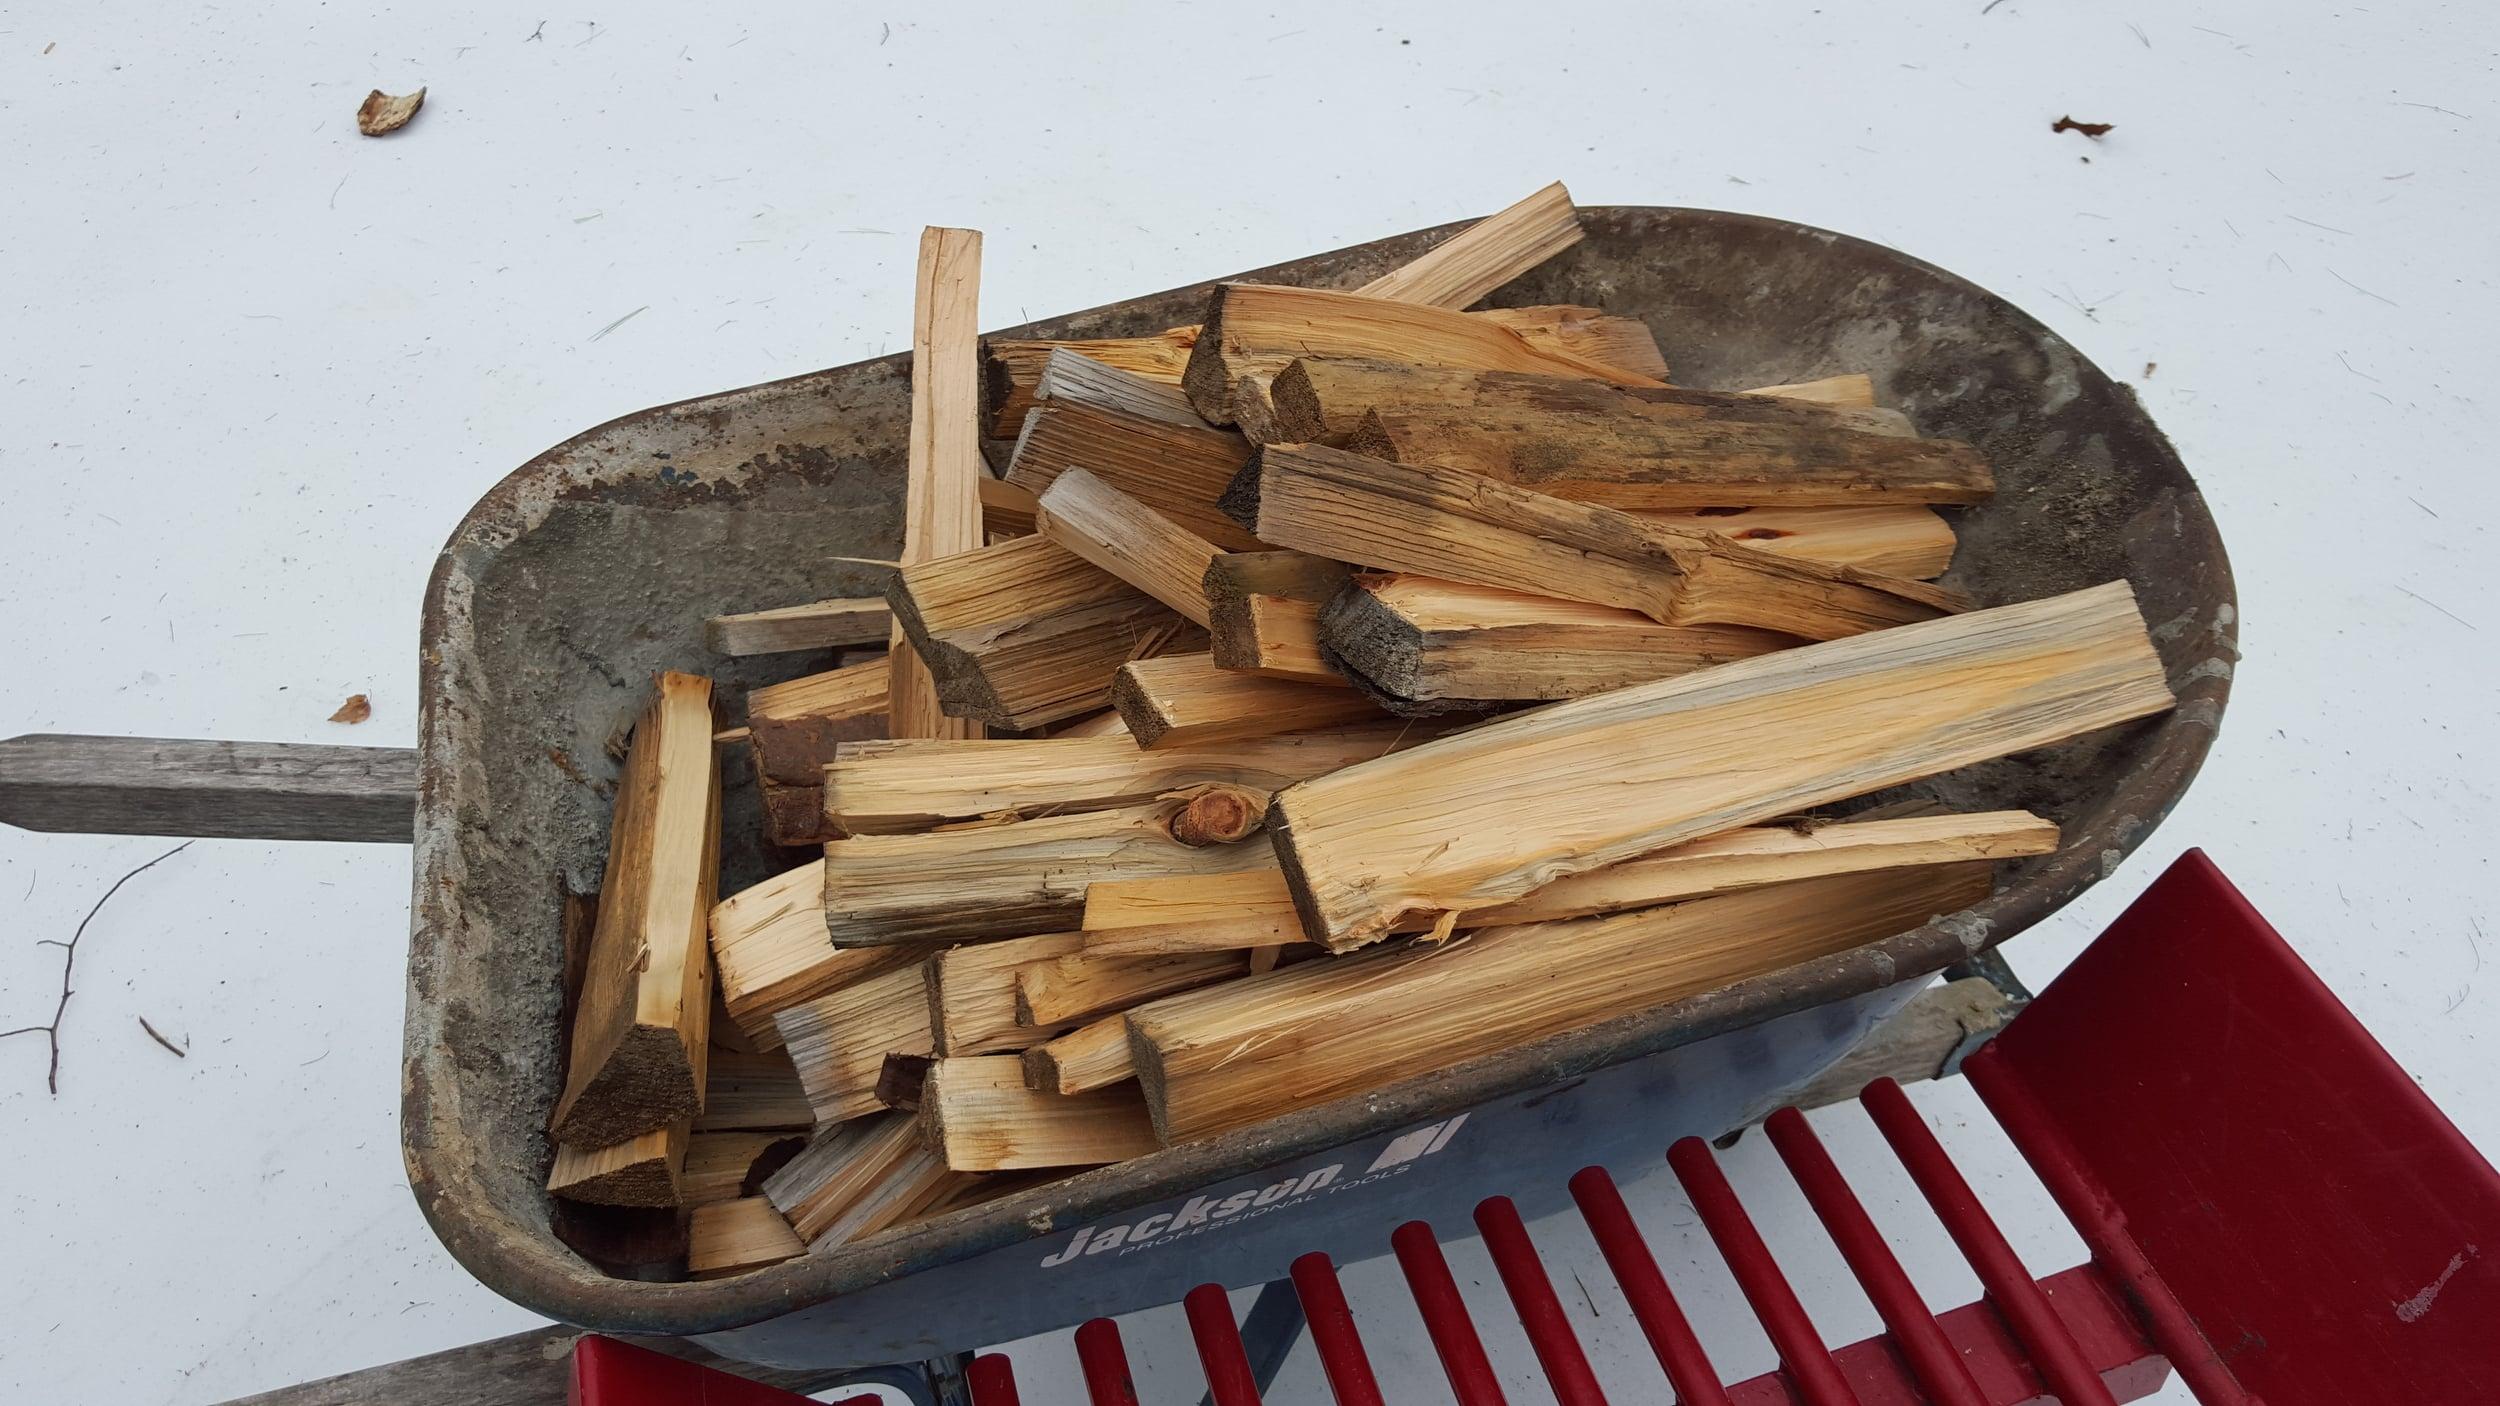 25 cubic feet of pine firewood makes 4 full wheelbarrows of kindling